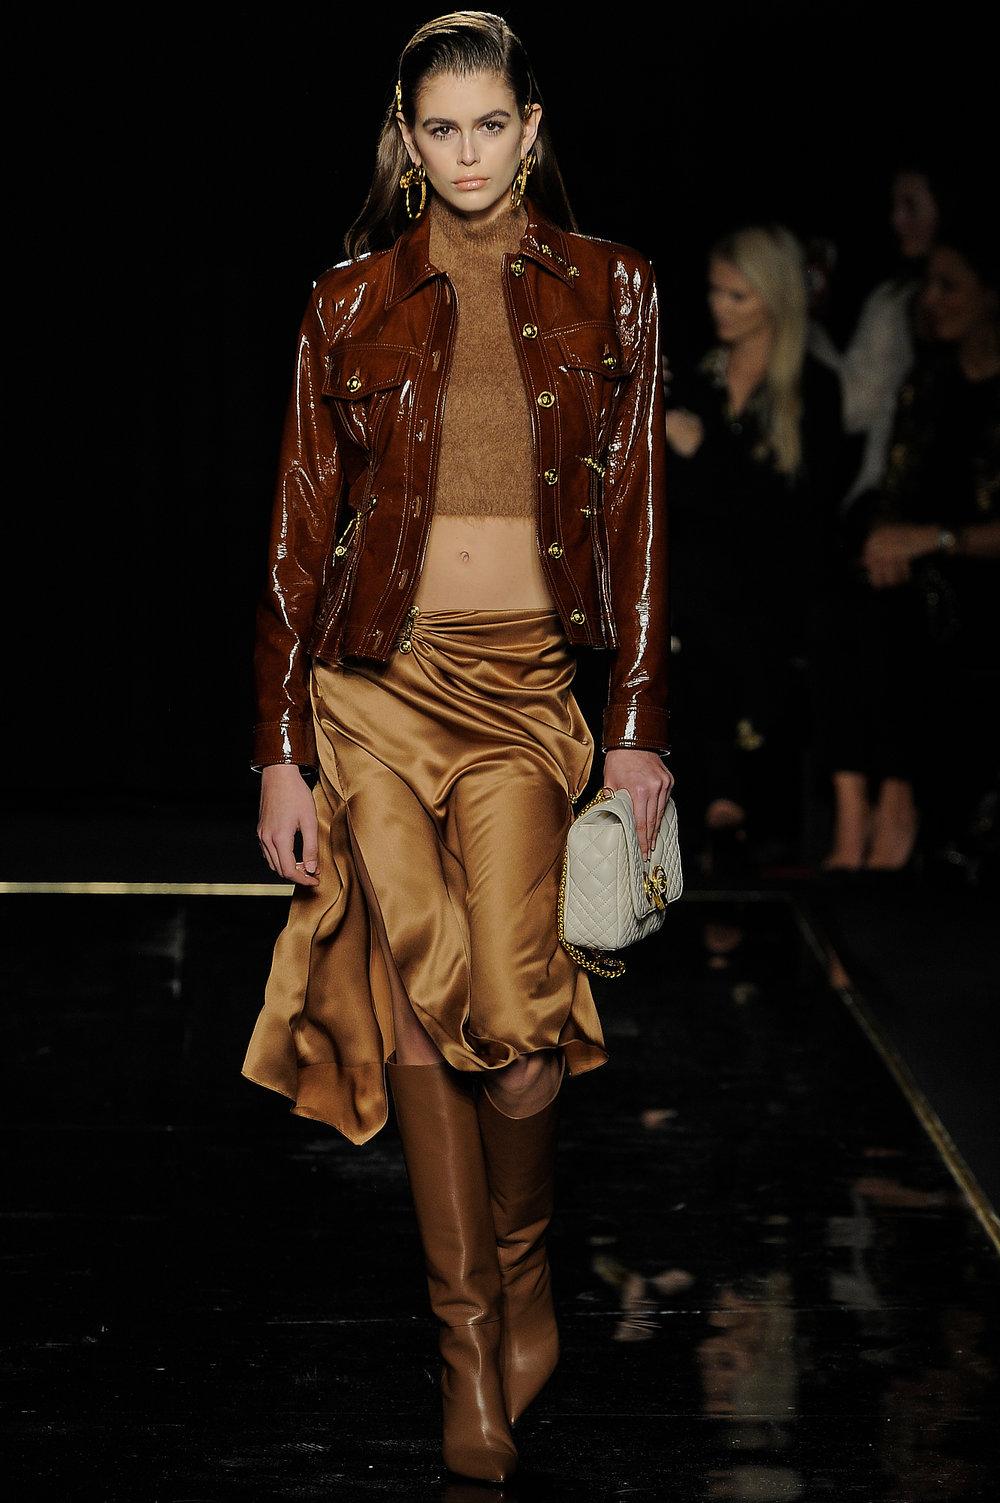 Versace_1_c1_versace_runway_runway_00001.jpg